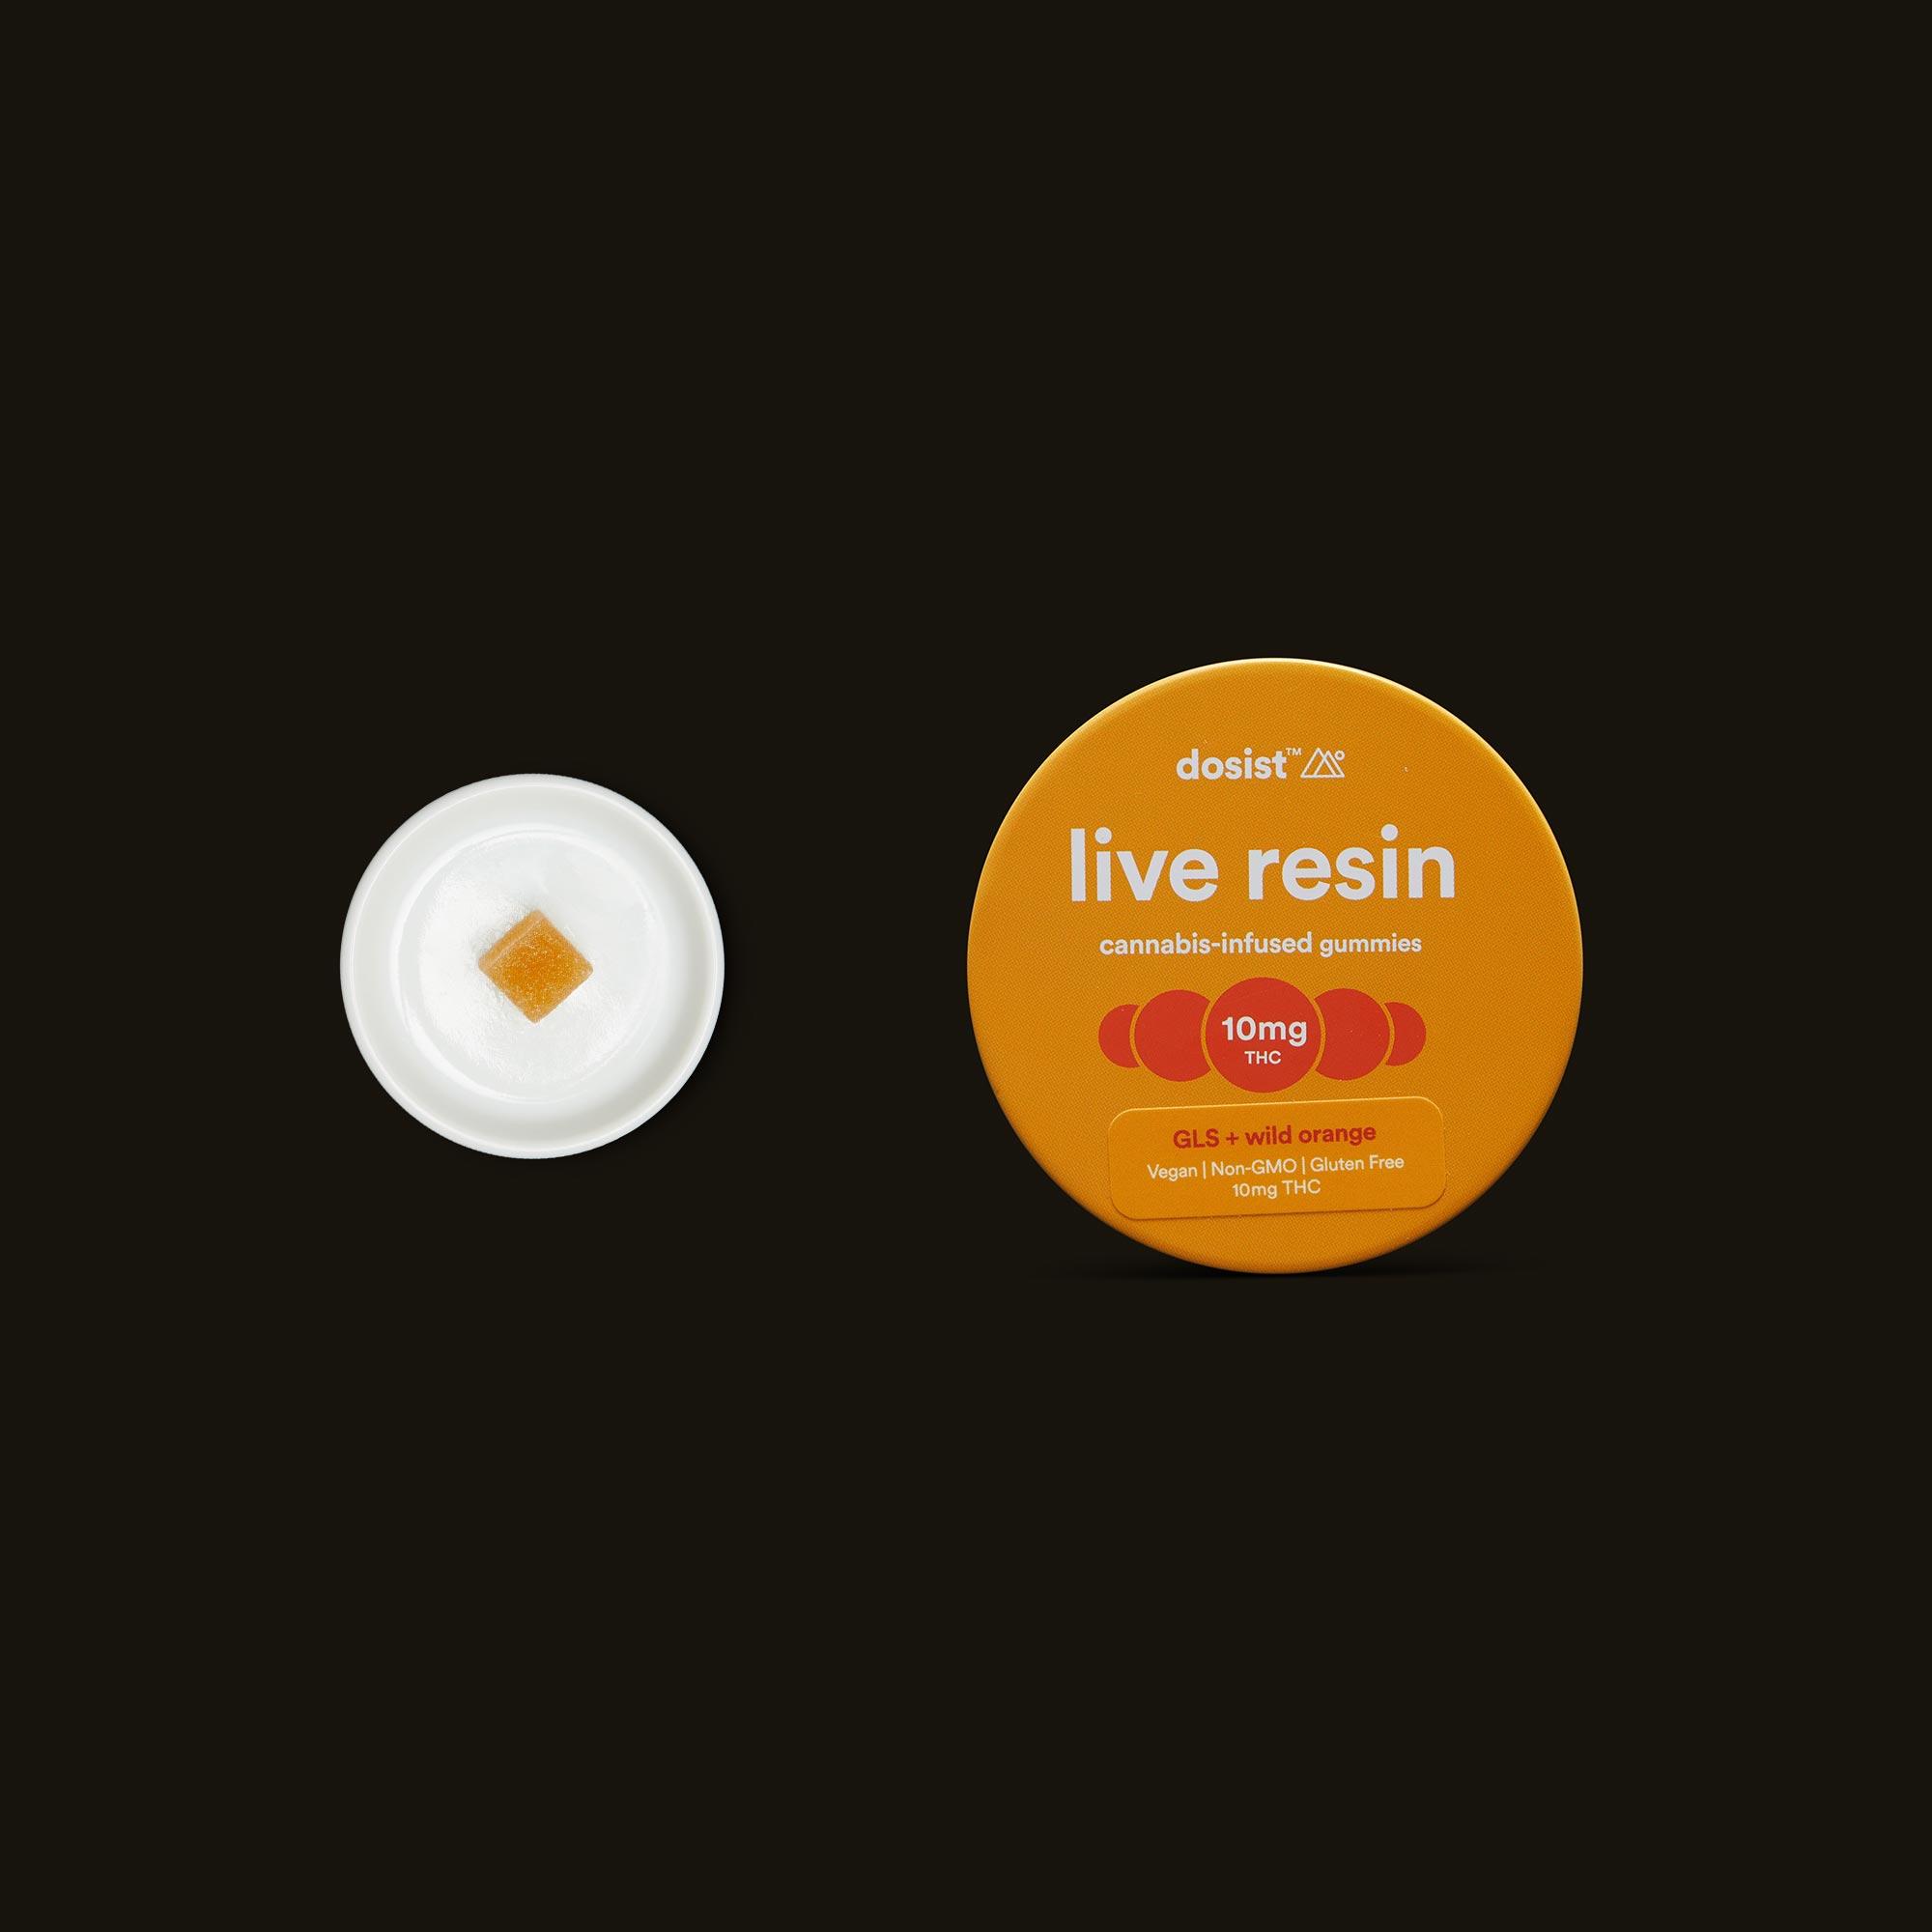 dosist live resin GLS indica + wild orange gummies